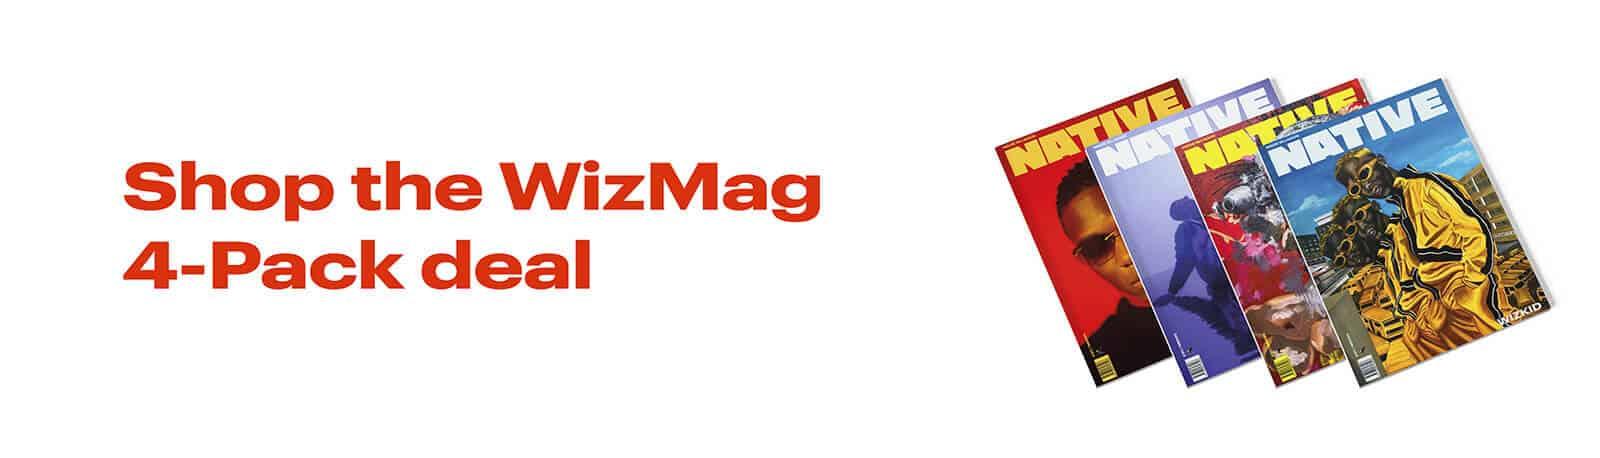 NATIVE Presents WizMag: 4-Pack Deal £65